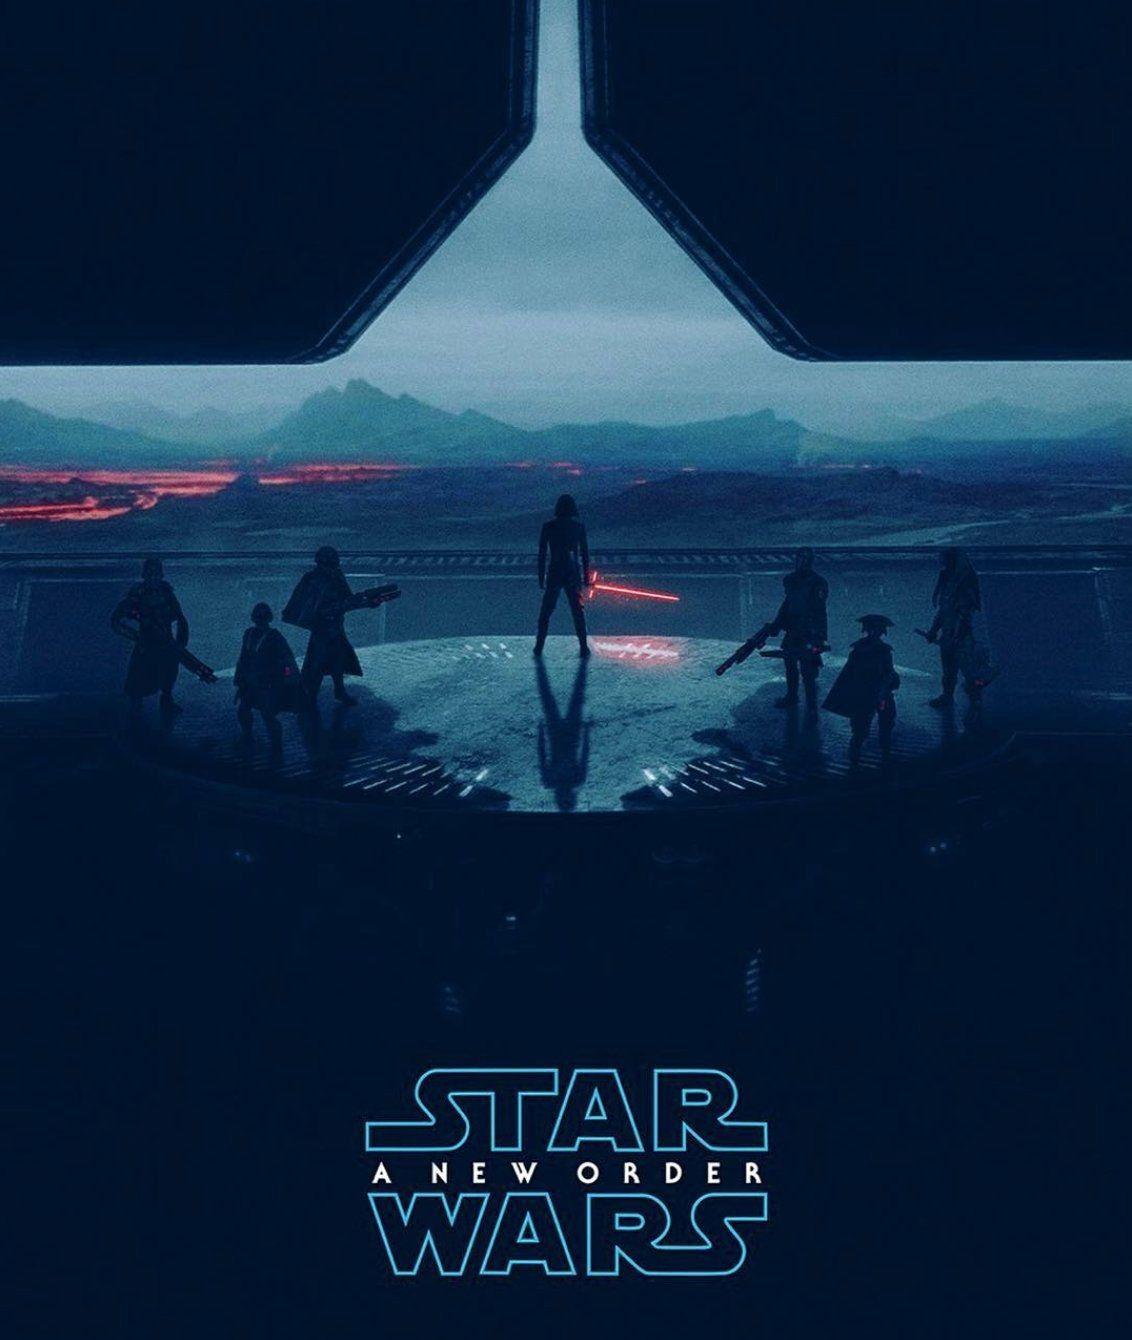 Star Wars Episode 9 Fan Poster | Star Wars | Star wars ... - photo#36